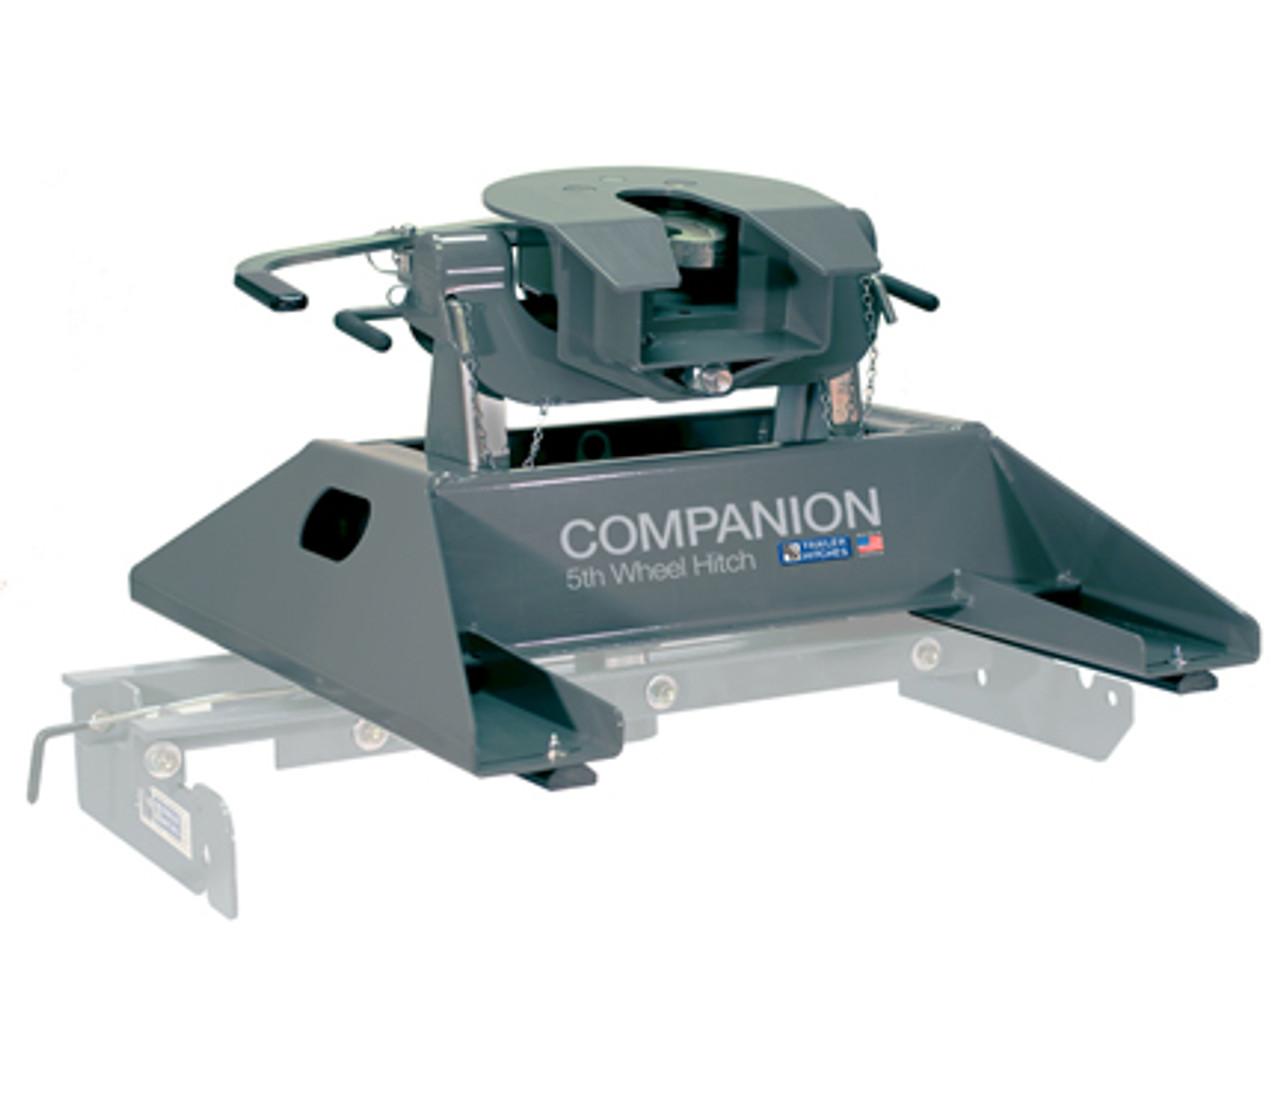 BW3500 --- B&W Companion 5th Wheel RV Hitch - Made in the USA